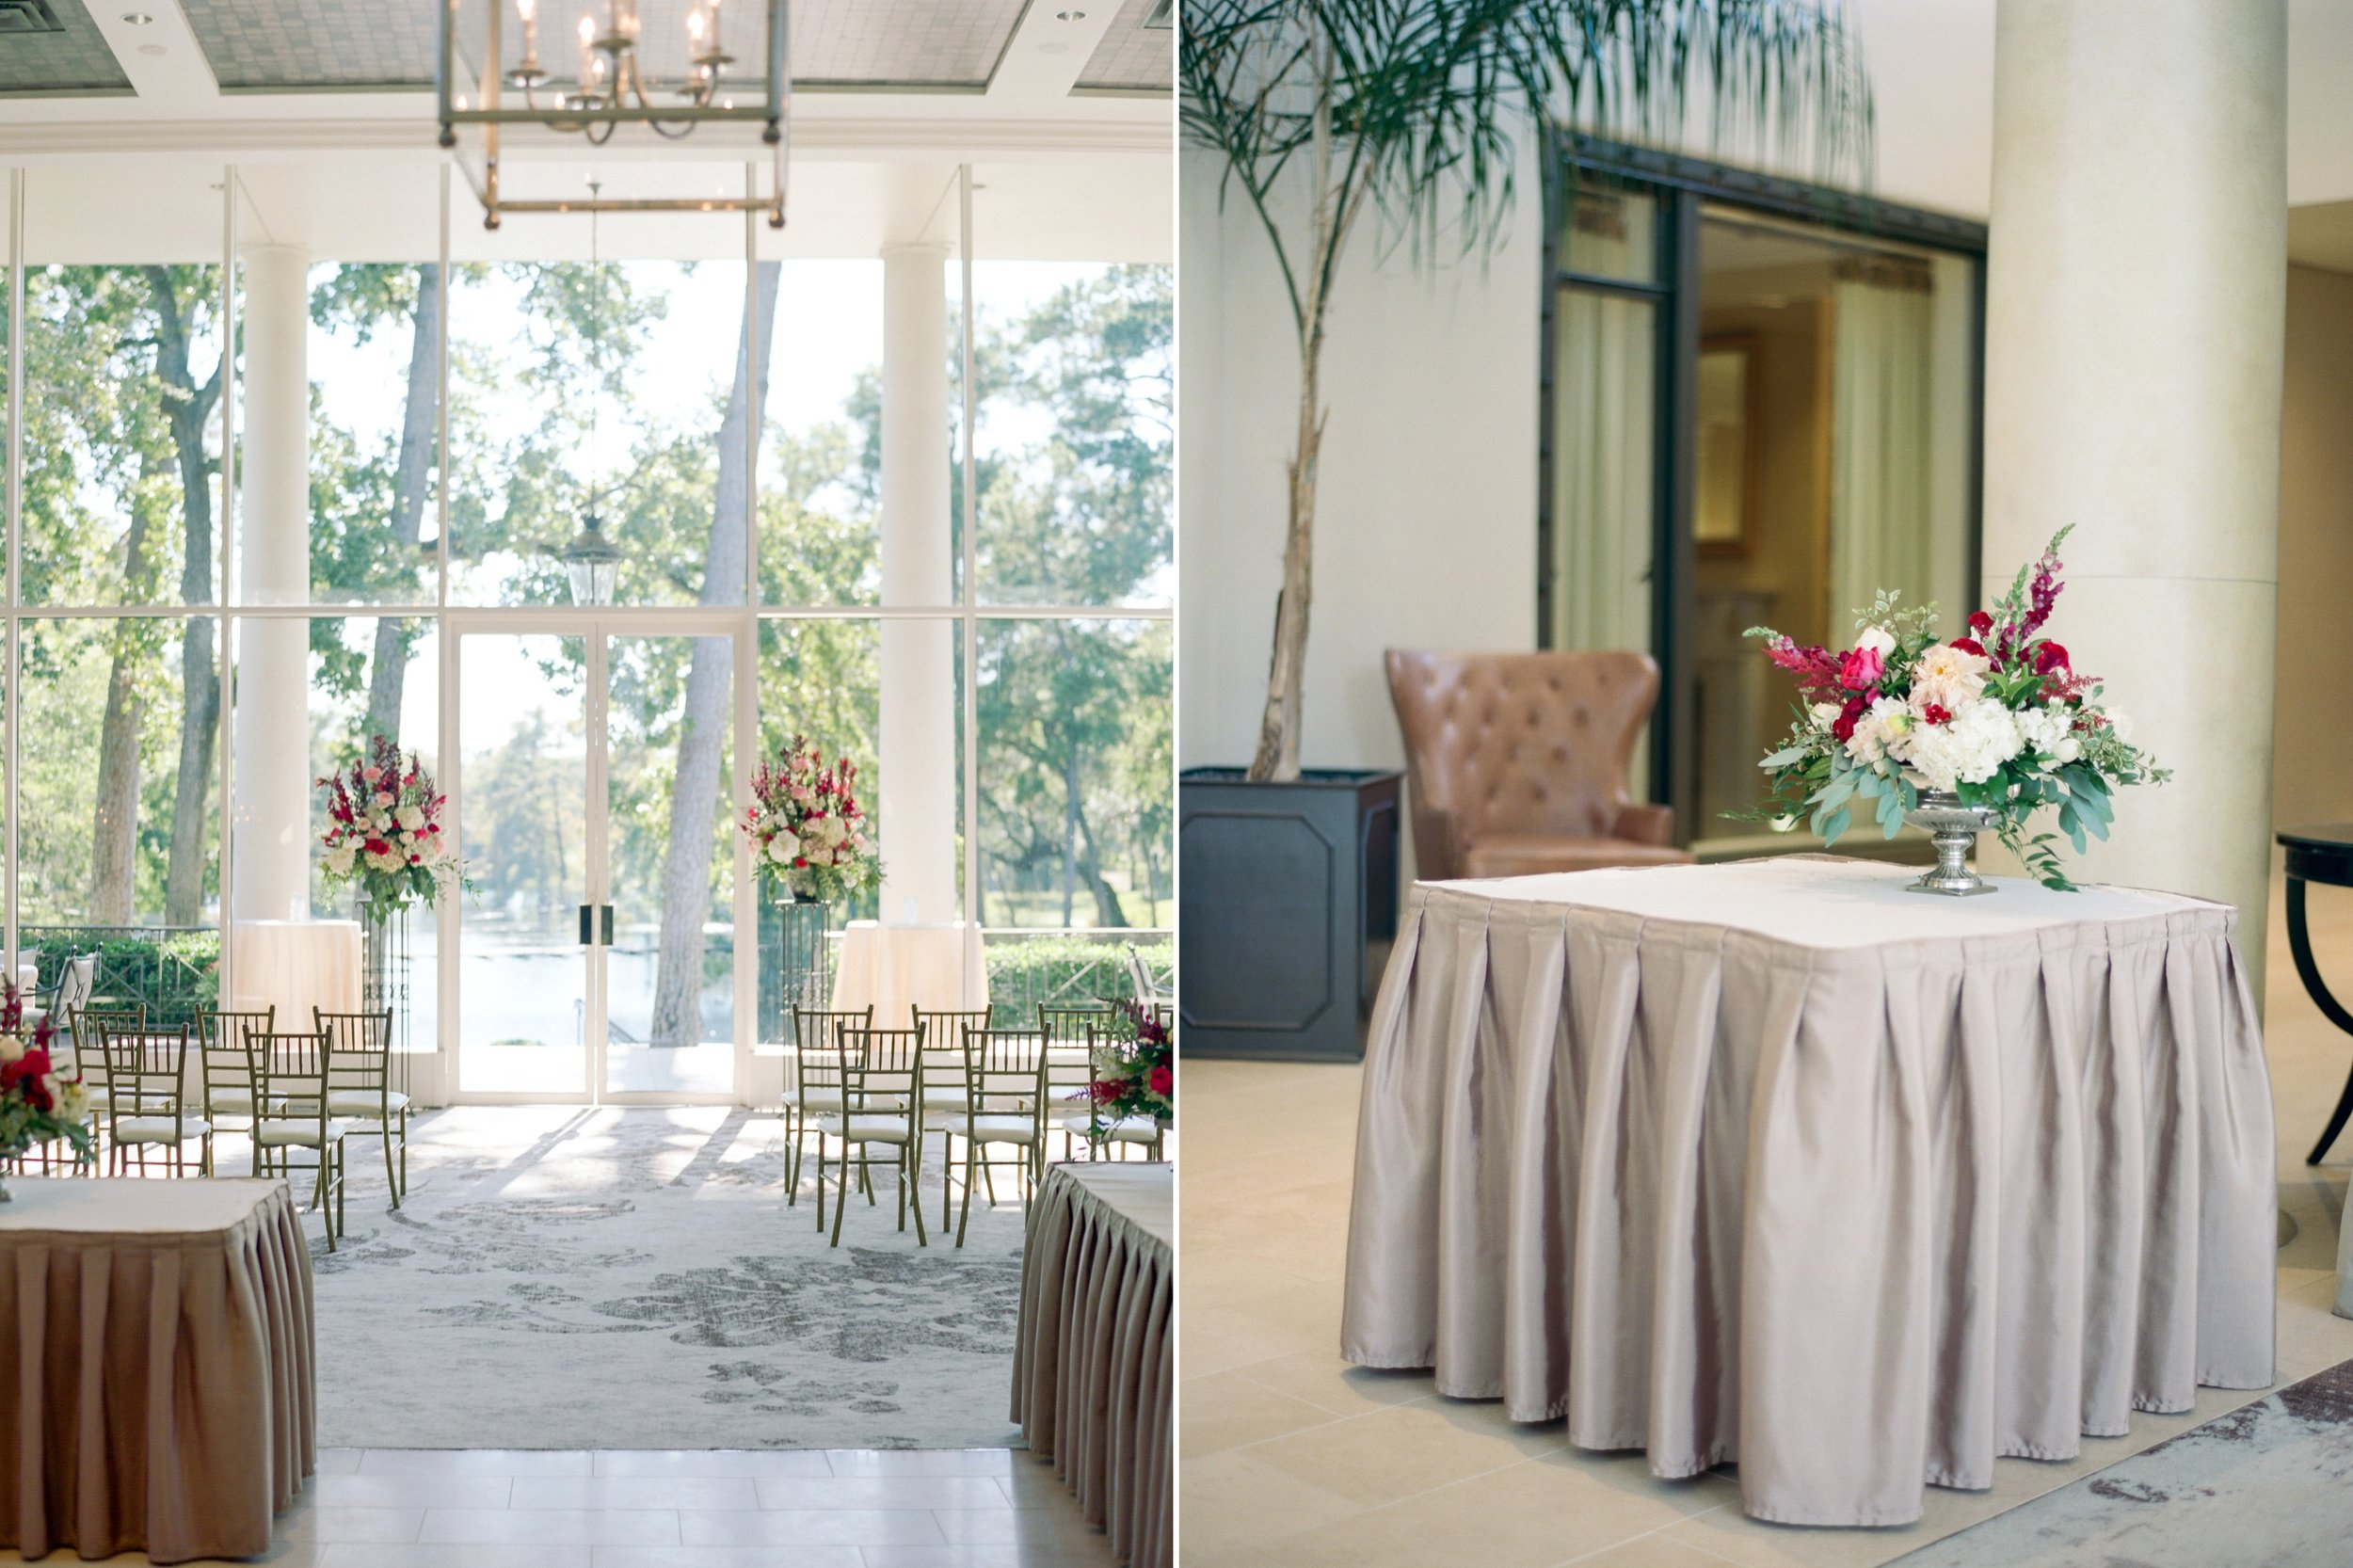 Houston-Wedding-Photographer-Lakeside-Country-Club-First-Look-Bride-Groom-Formals-Film-Fine-Art-Photography-203.jpg